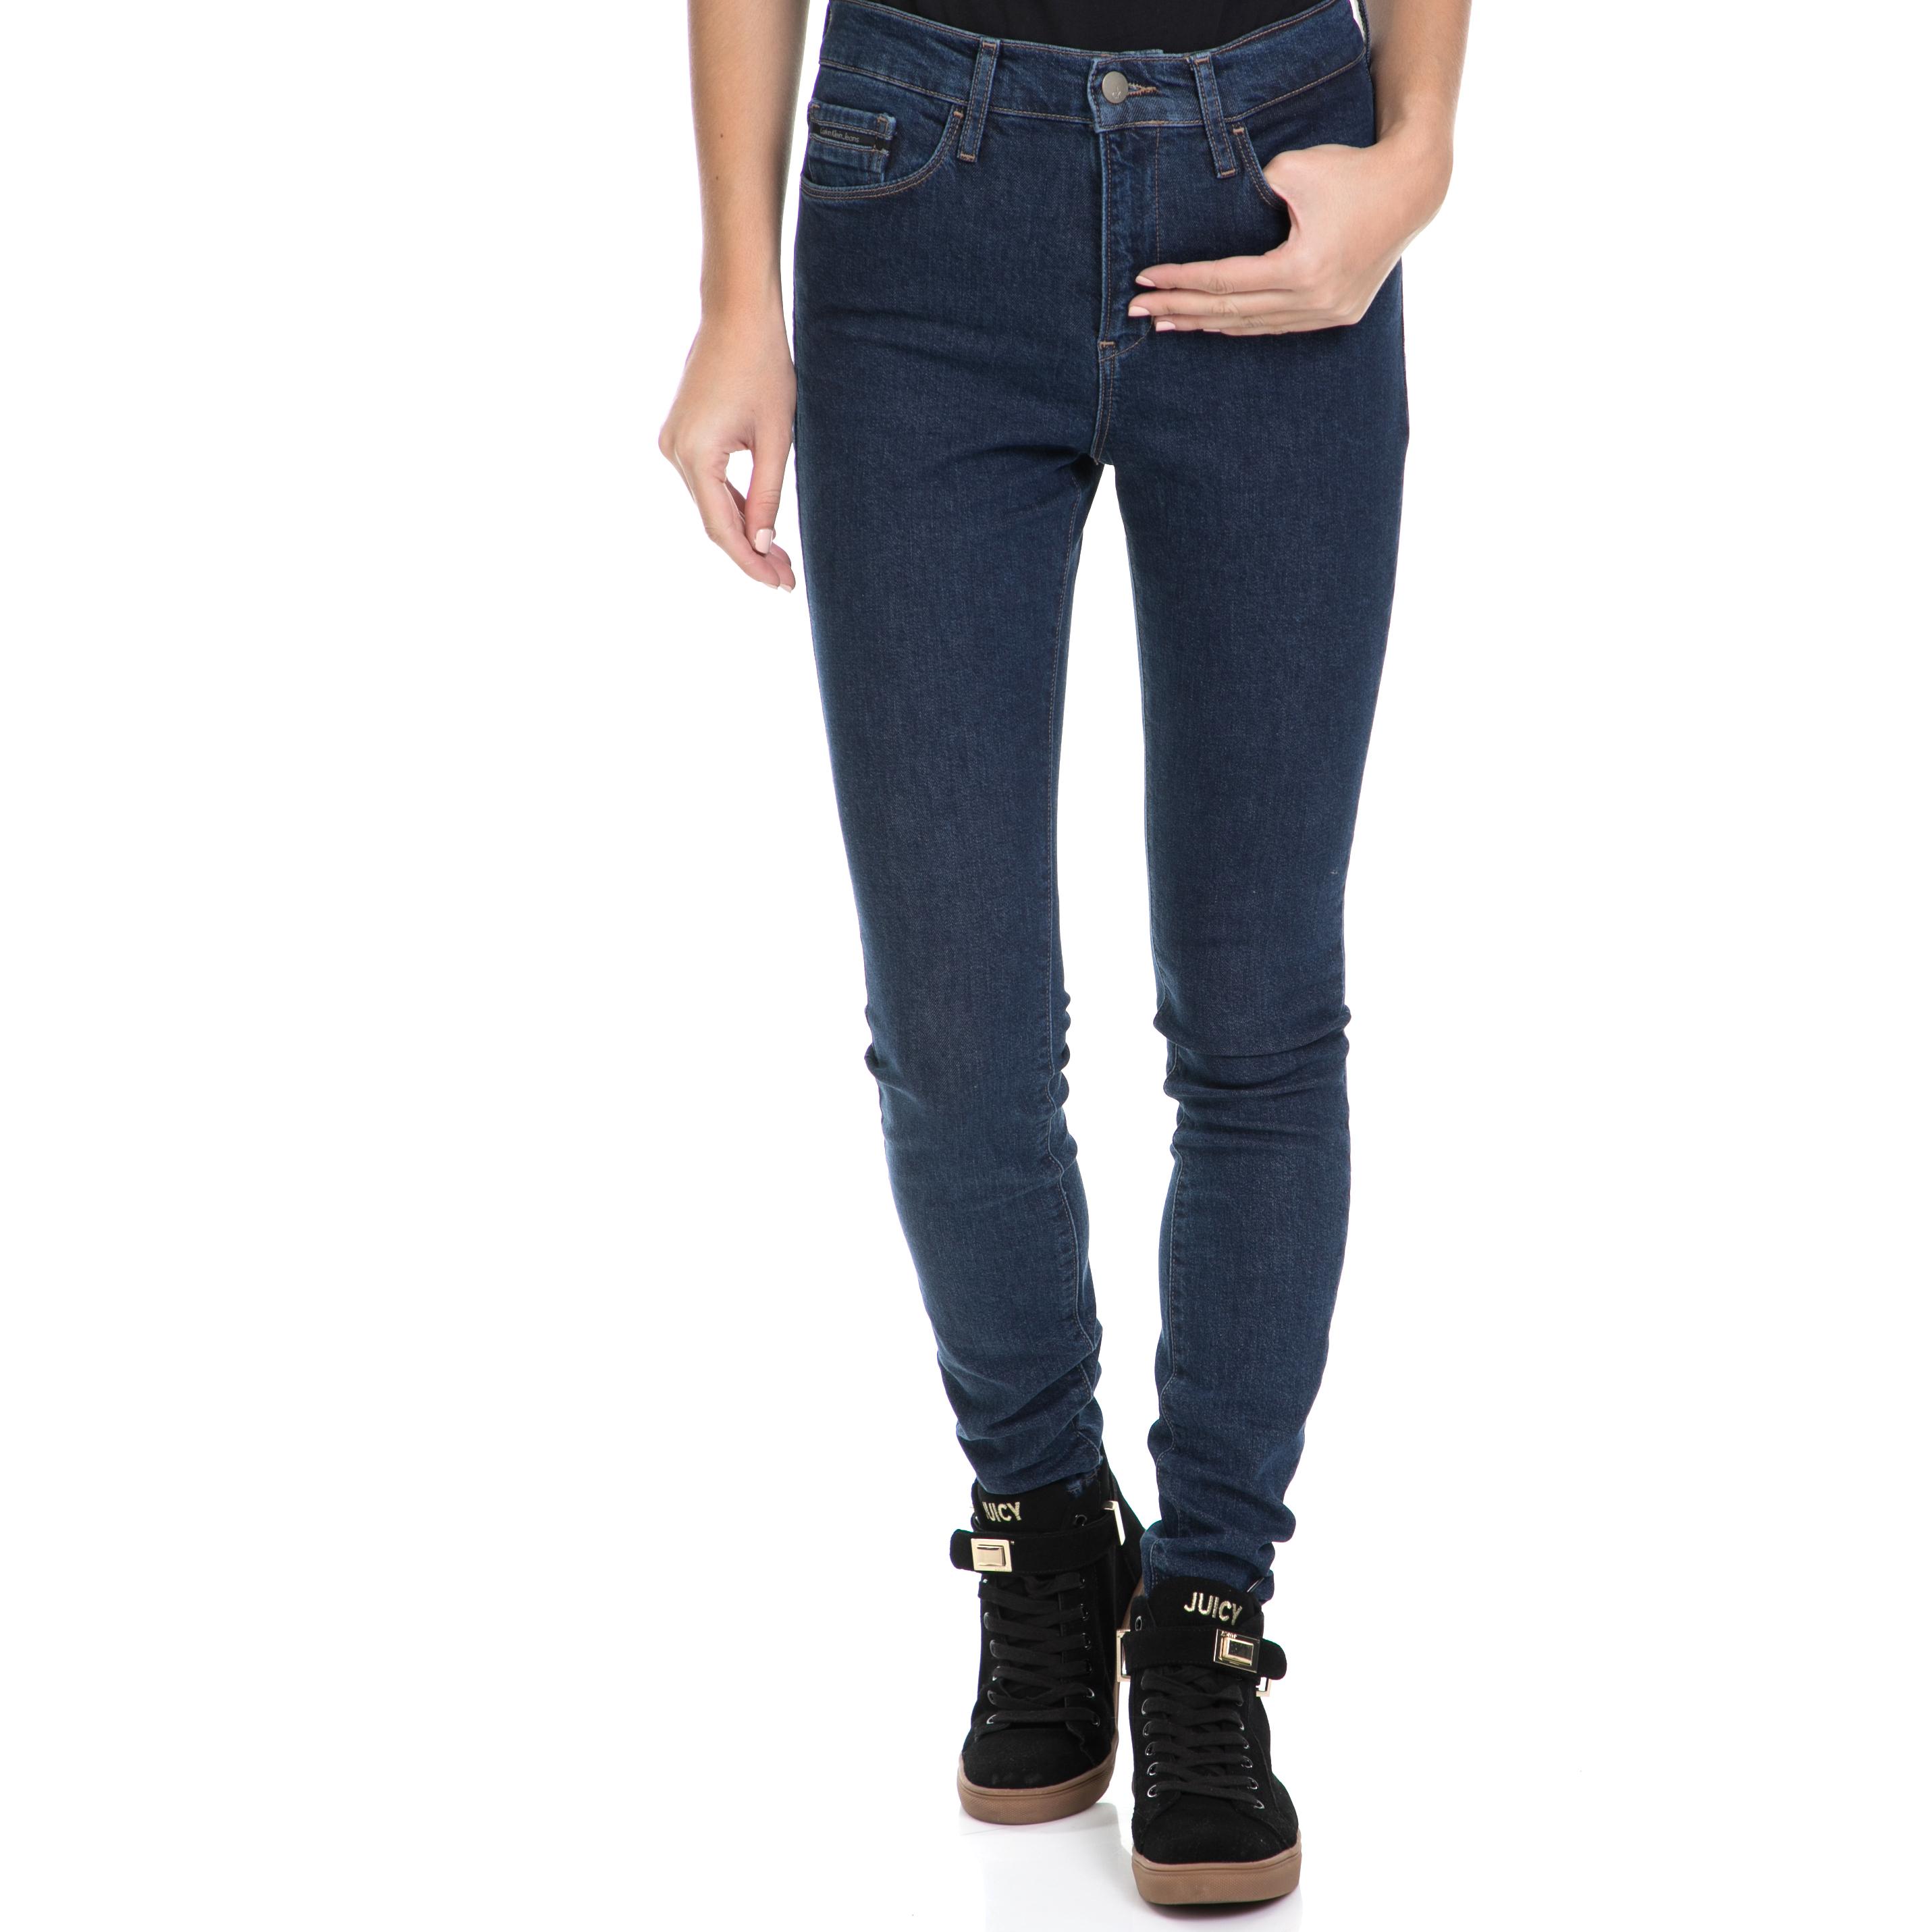 CALVIN KLEIN JEANS – Γυναικείο τζιν παντελόνι High Rise Skinny – Bice Dark μπλε